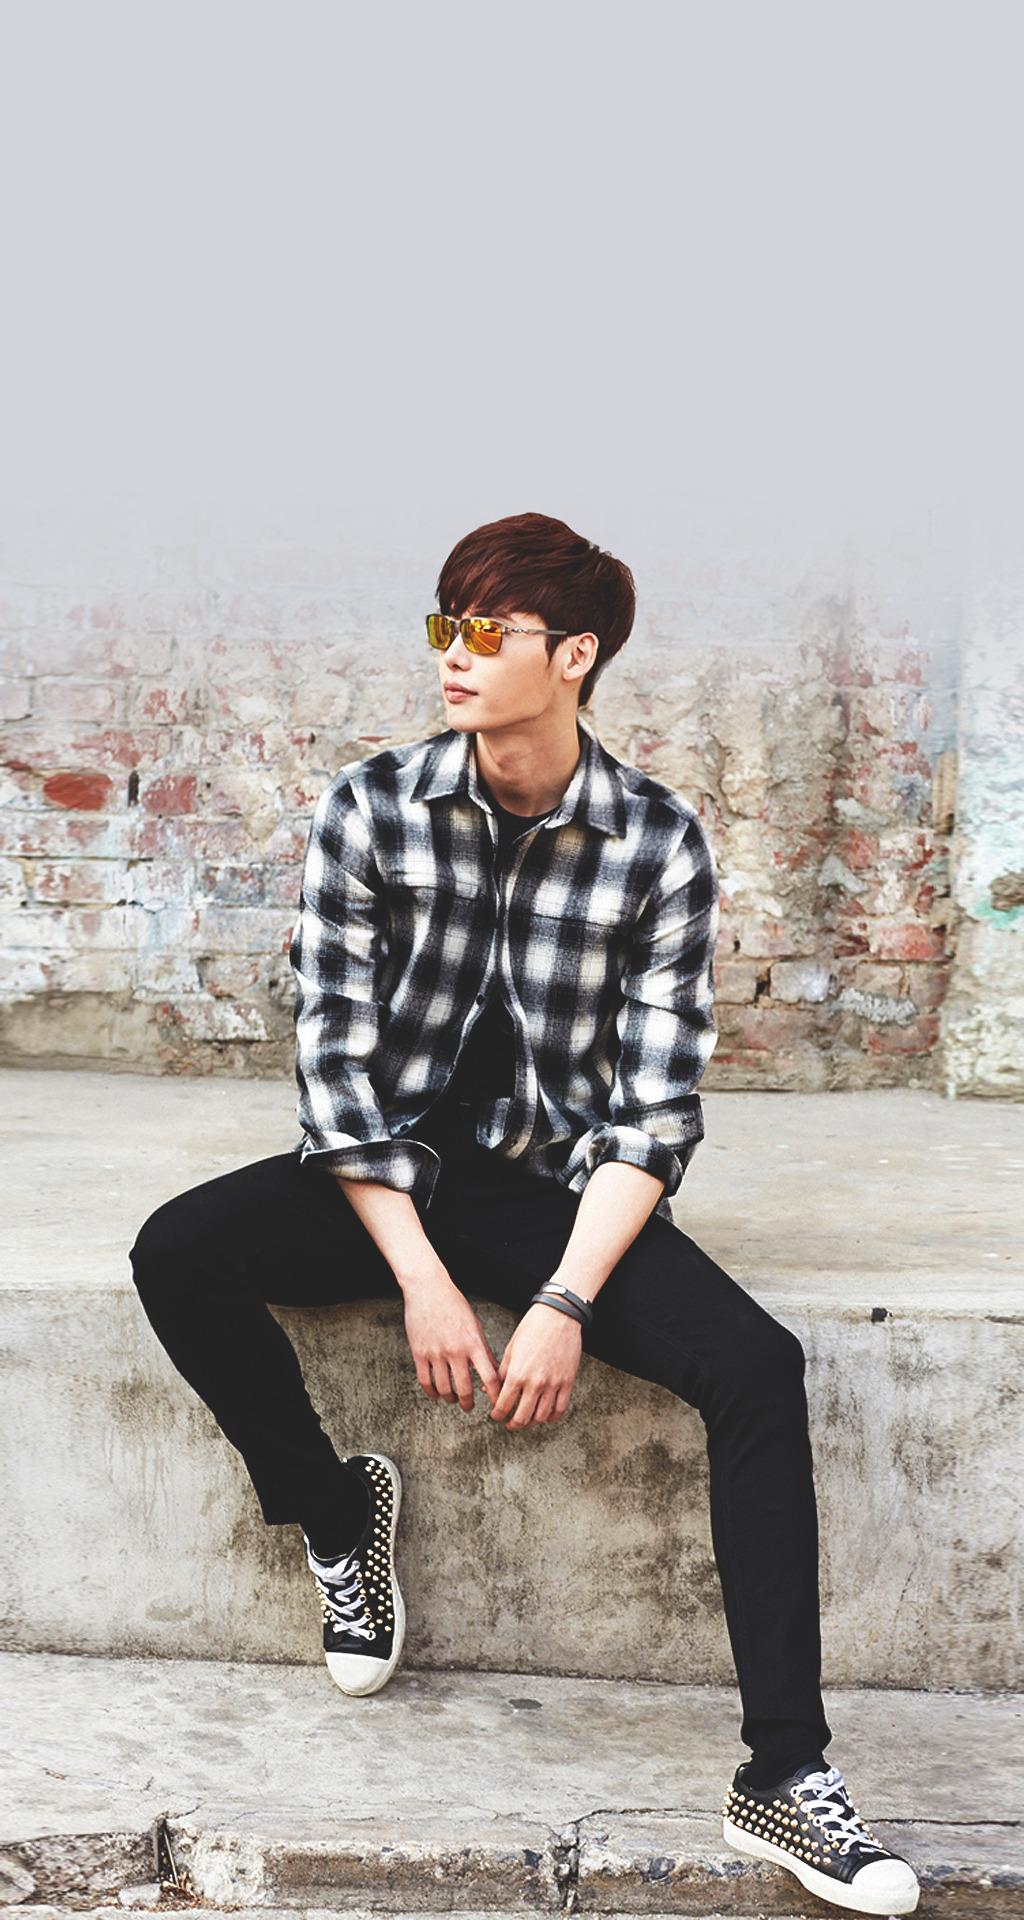 Lee Jong Suk 2018 1188637 Hd Wallpaper Backgrounds